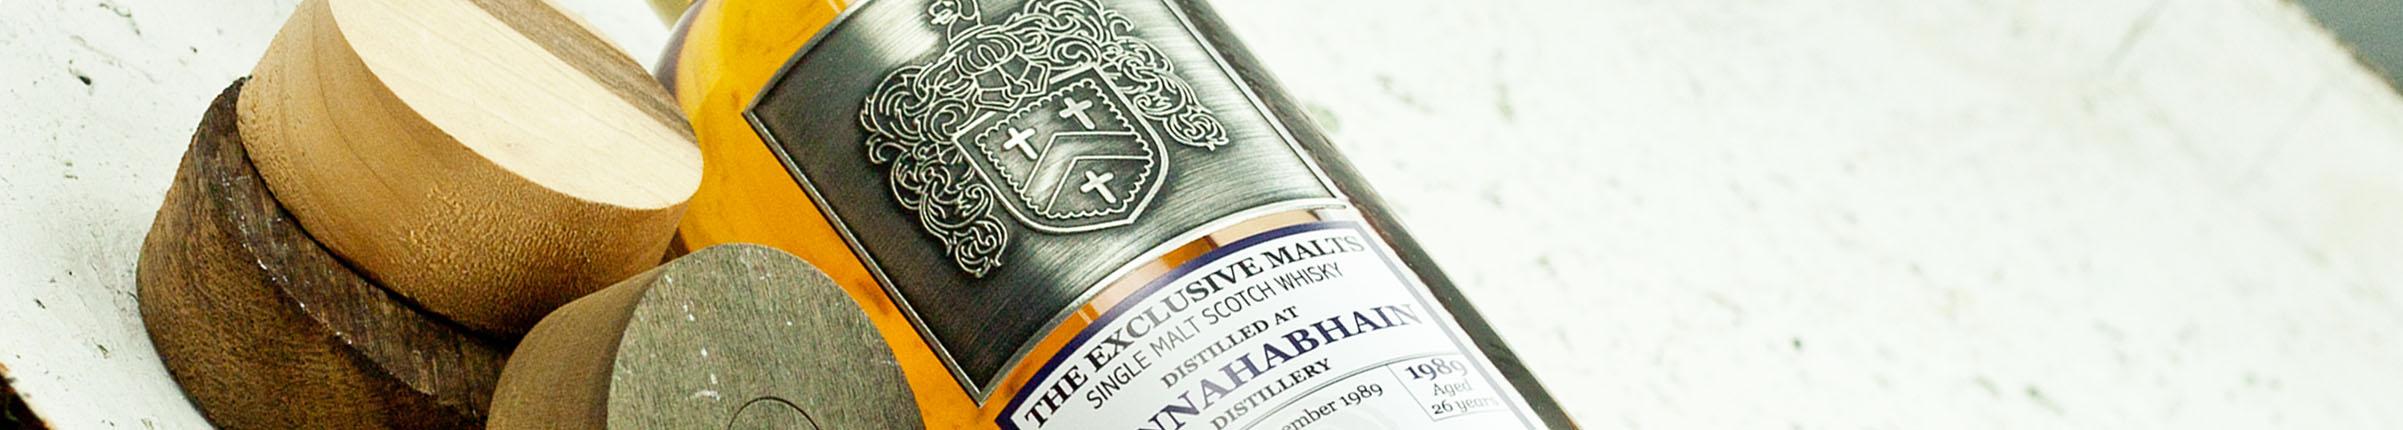 Creative Whisky Co.